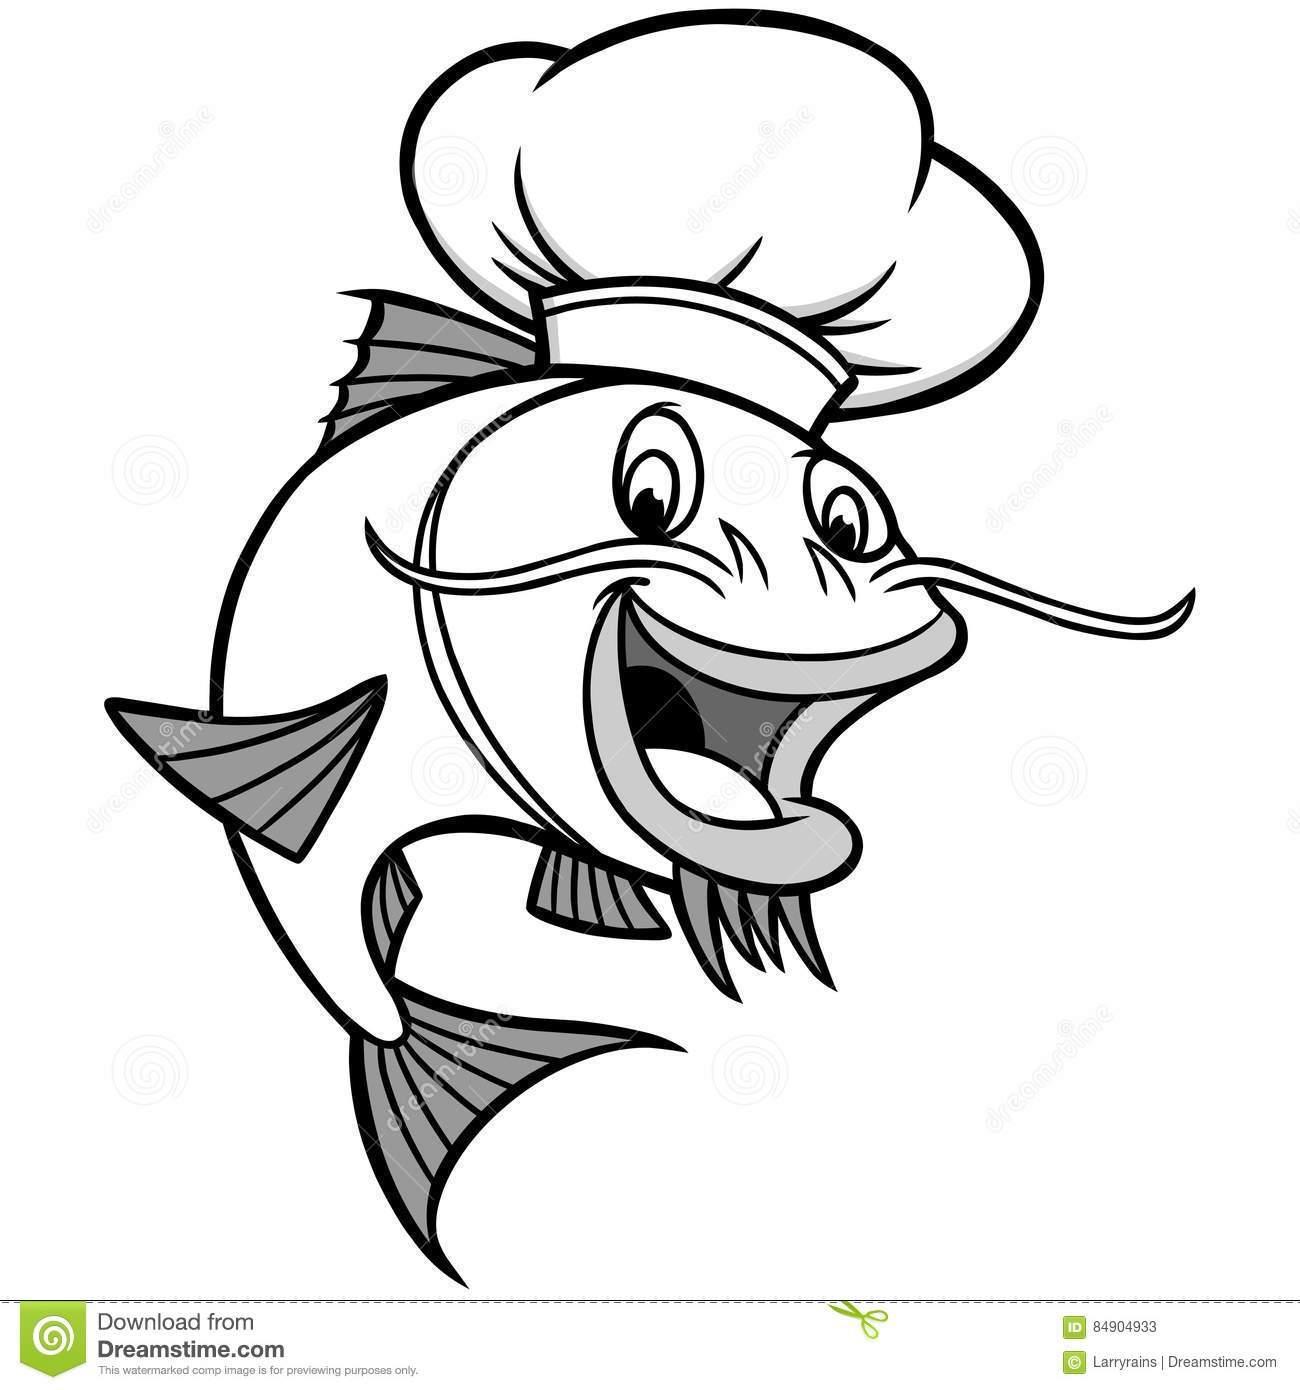 Catfish clipart black and white 9 » Clipart Portal.